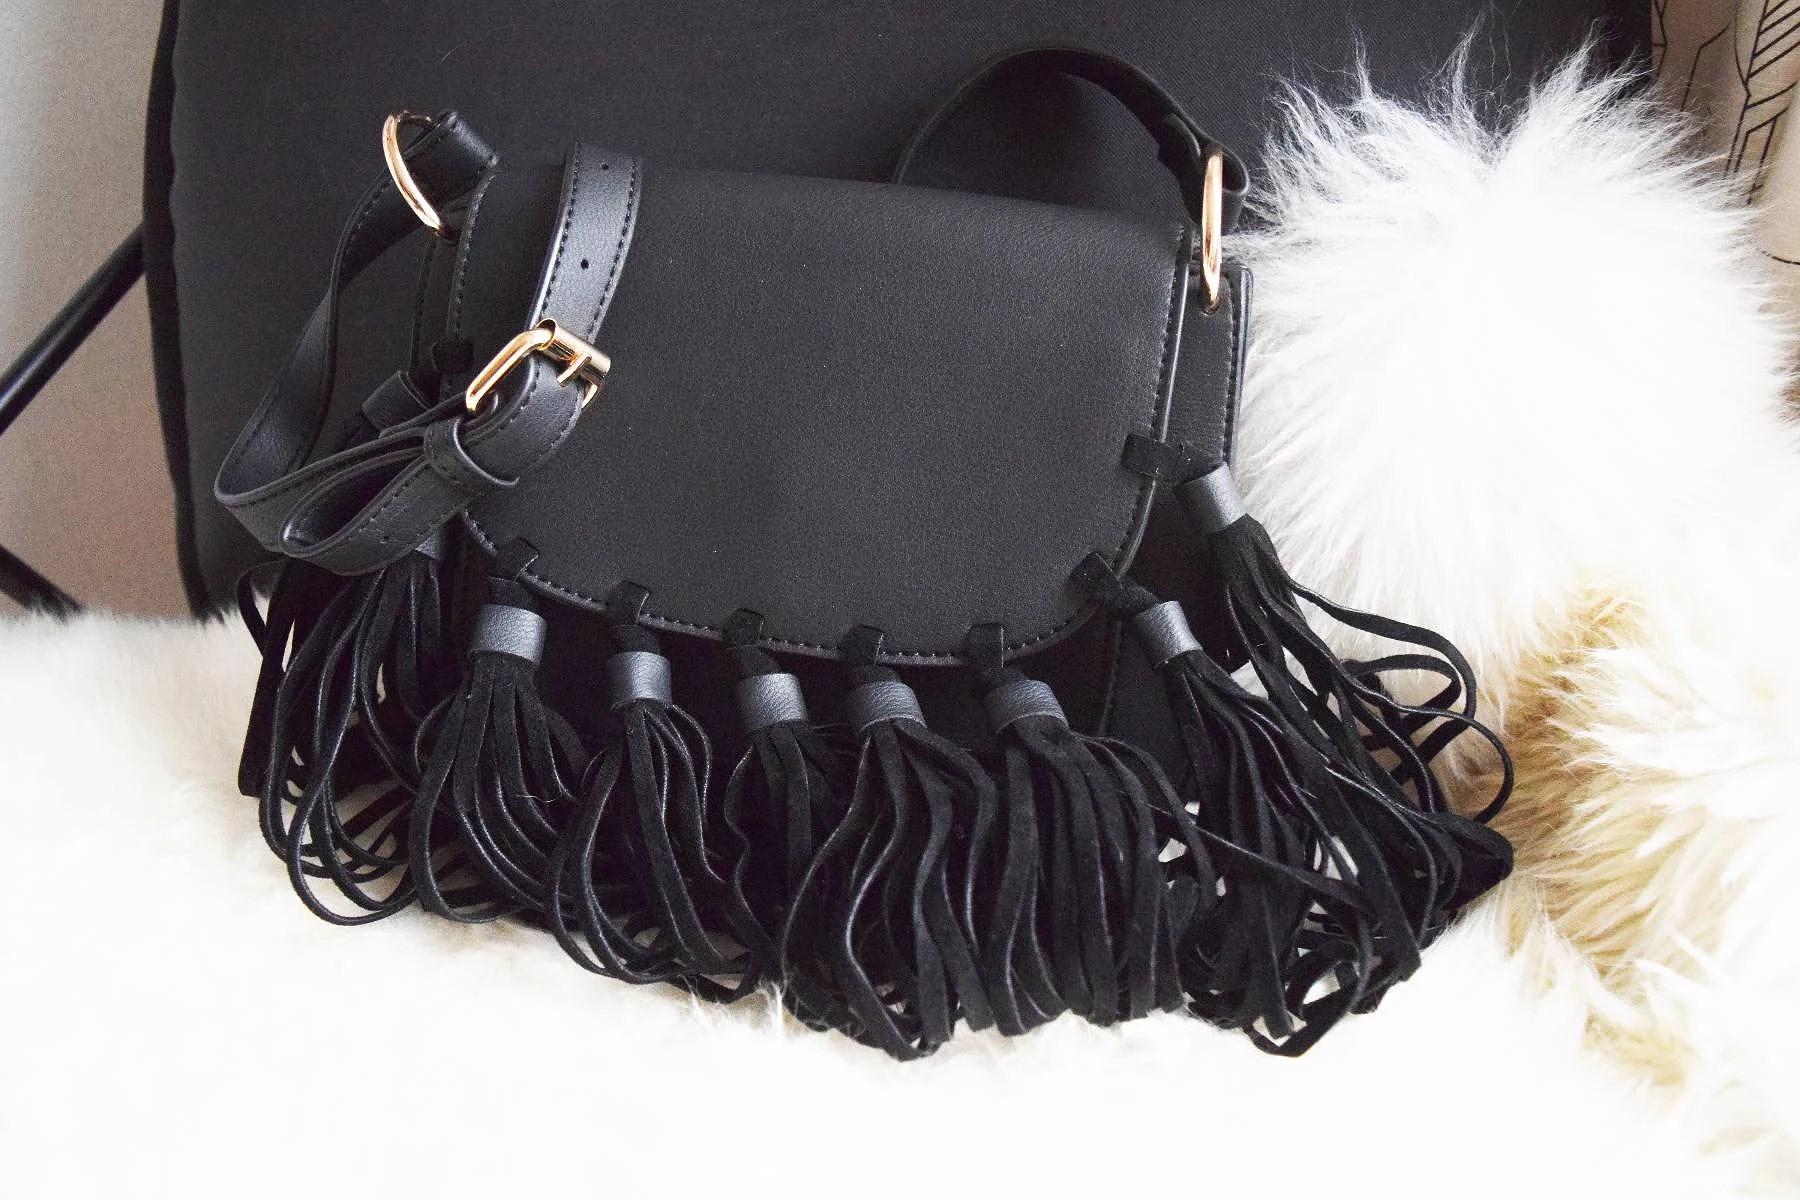 Paket: Ny väska!